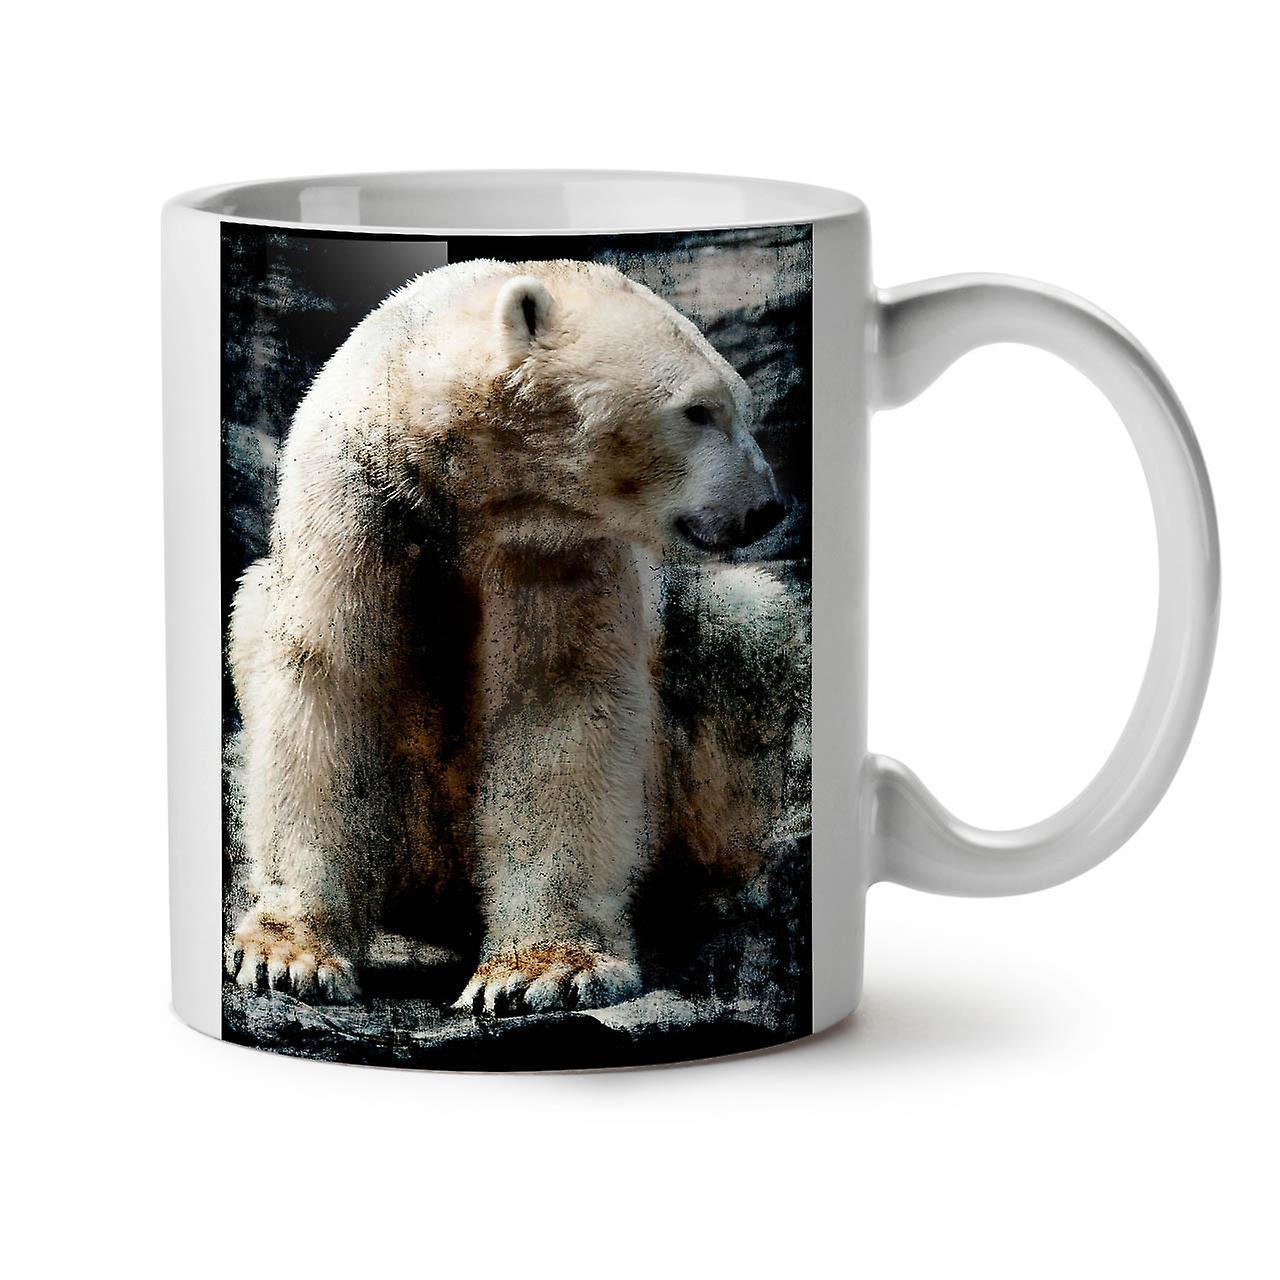 OzWellcoda Café 11 Céramique Polaire Nouveau Blanc Tasse Thé L'ours Animal Sauvage wZlOiPukXT